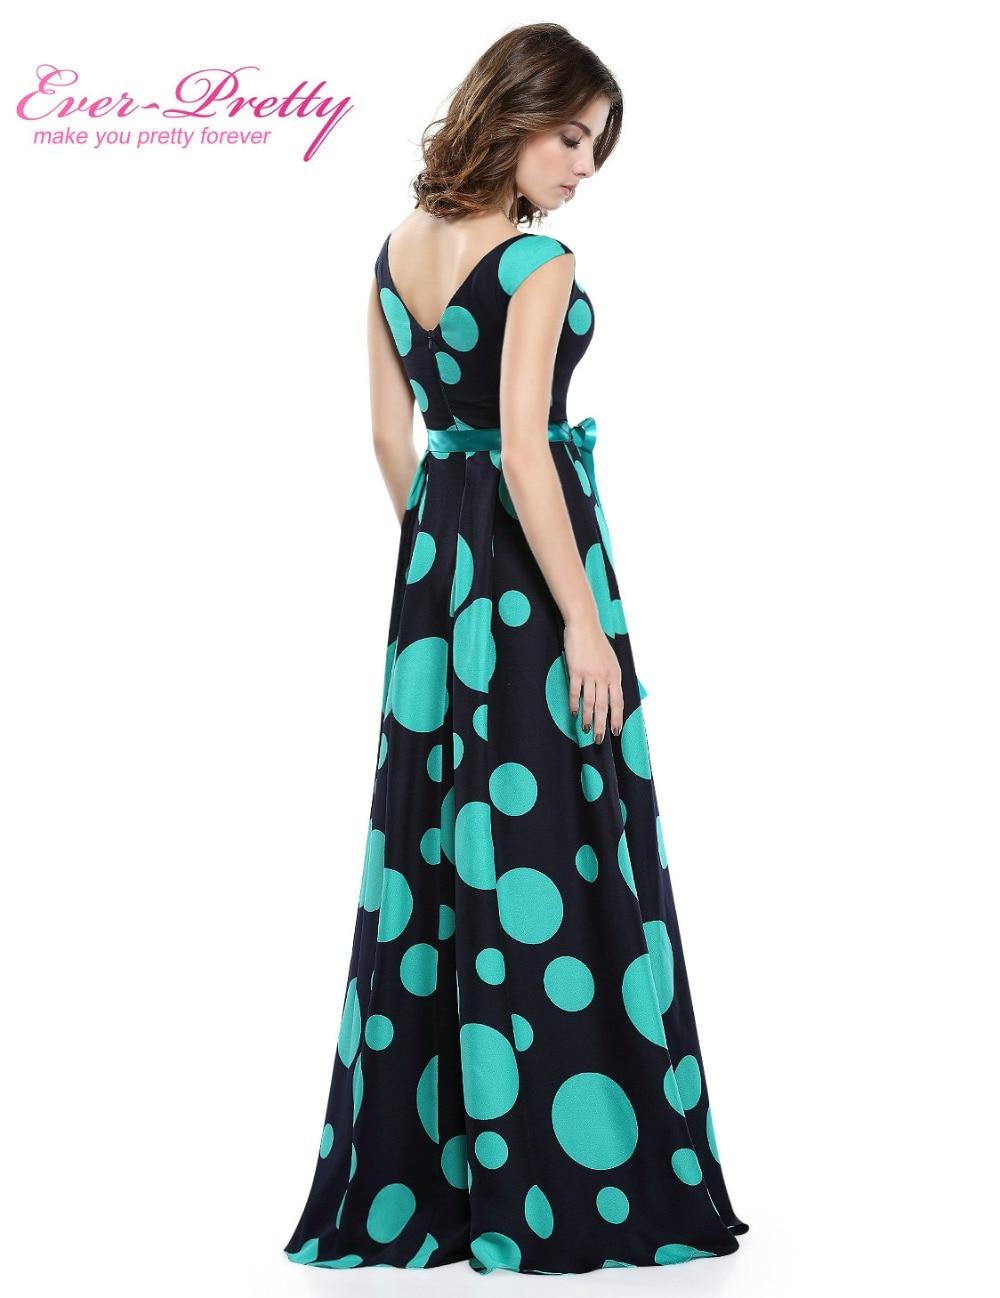 Berühmt Prom Kleid Ausverkauf Fotos - Brautkleider Ideen - cashingy.info